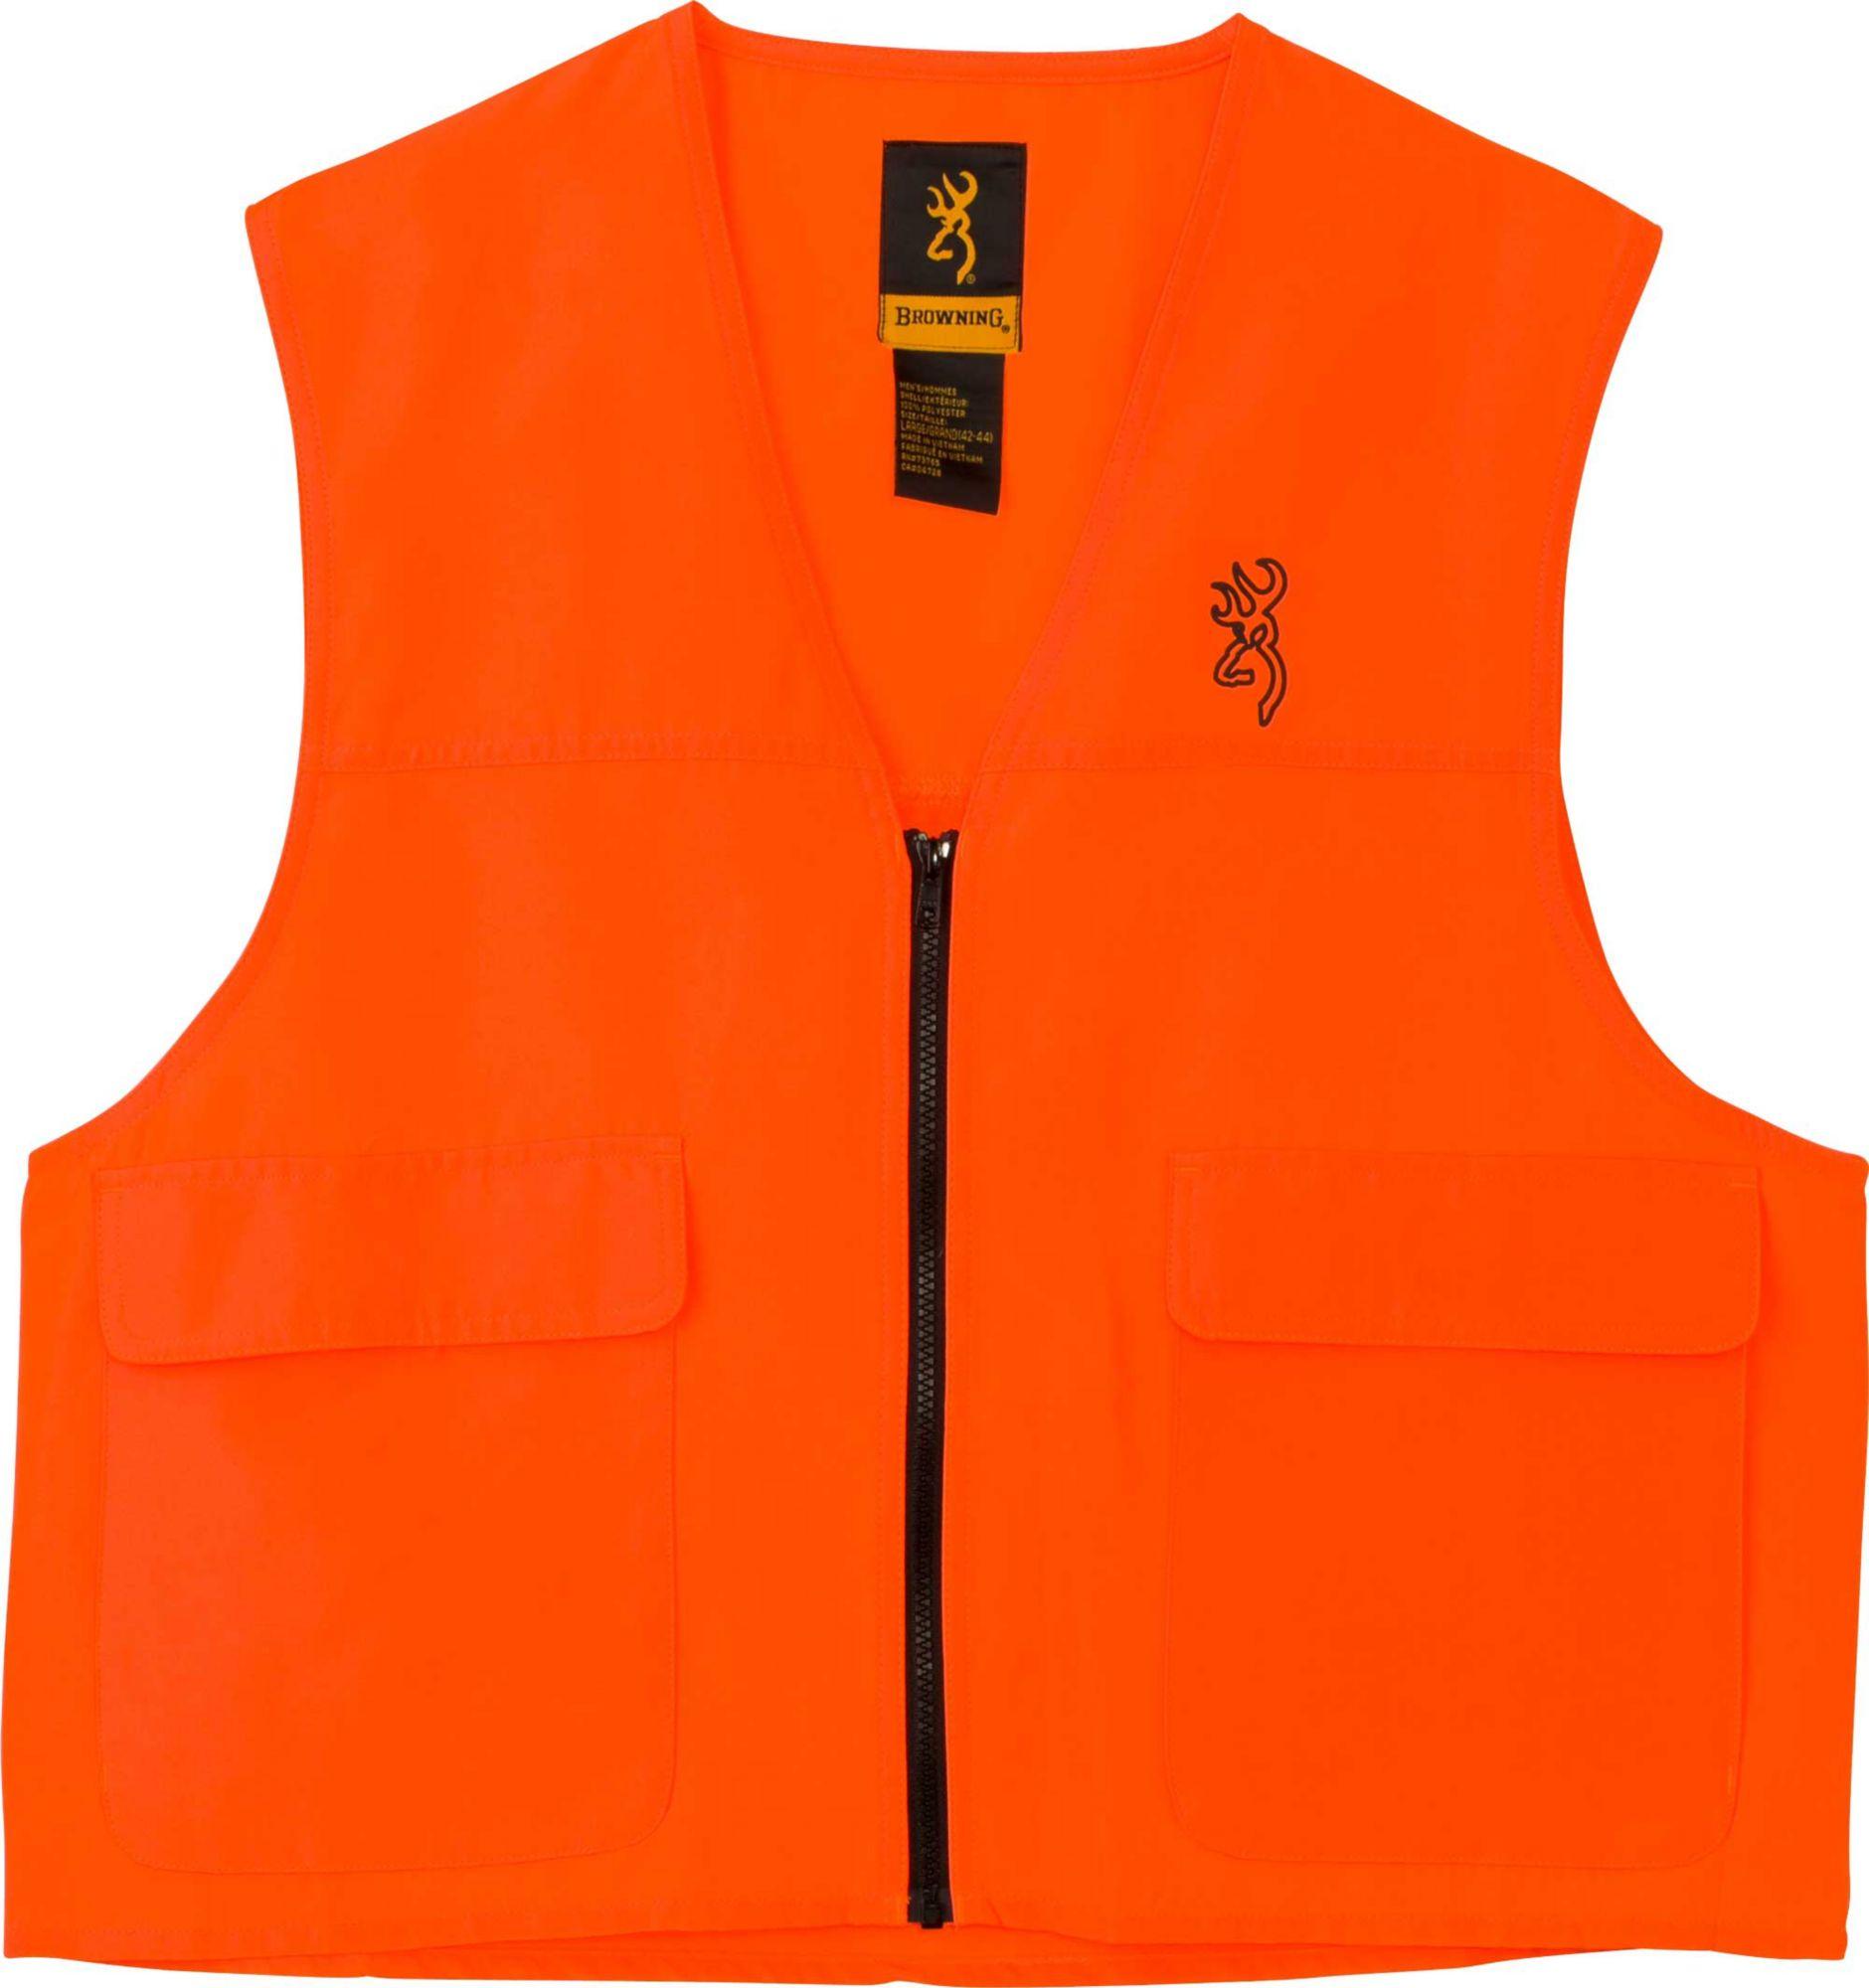 Browning Safety Blaze Hunting Vest, Men's, Size: XL, Blaze Orange thumbnail